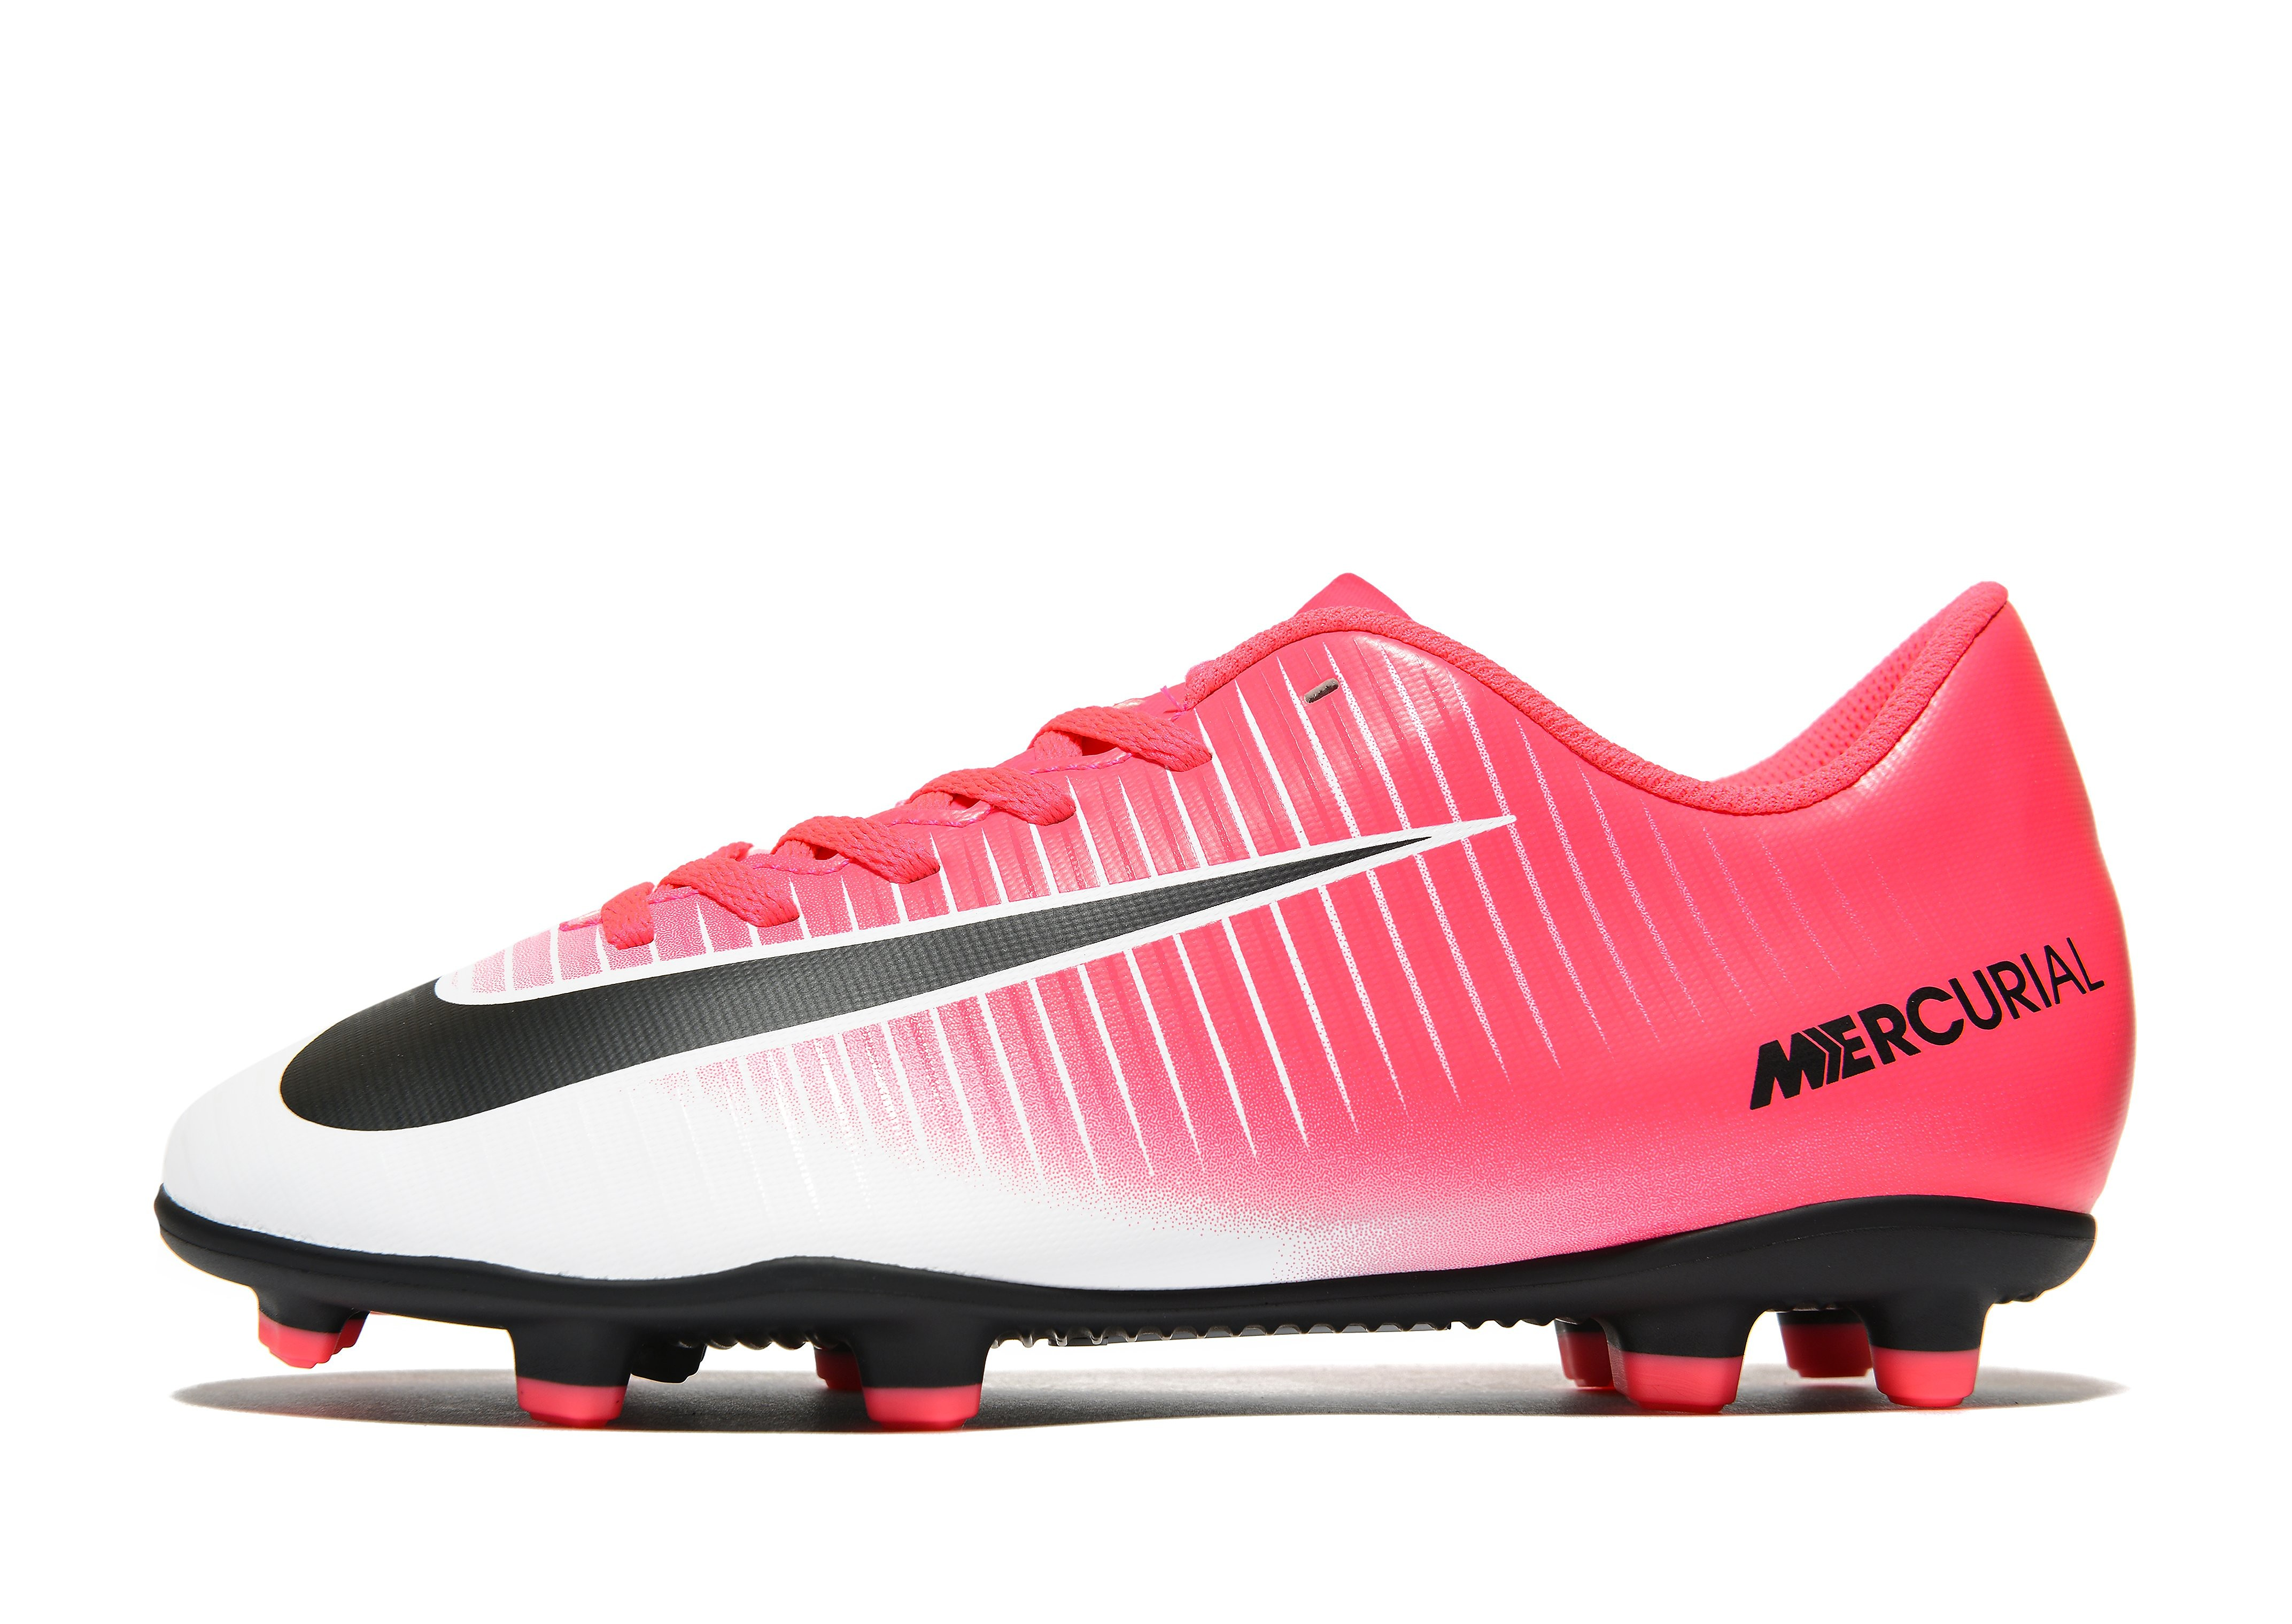 Nike Mercurial Victory VI Firm Ground Junior